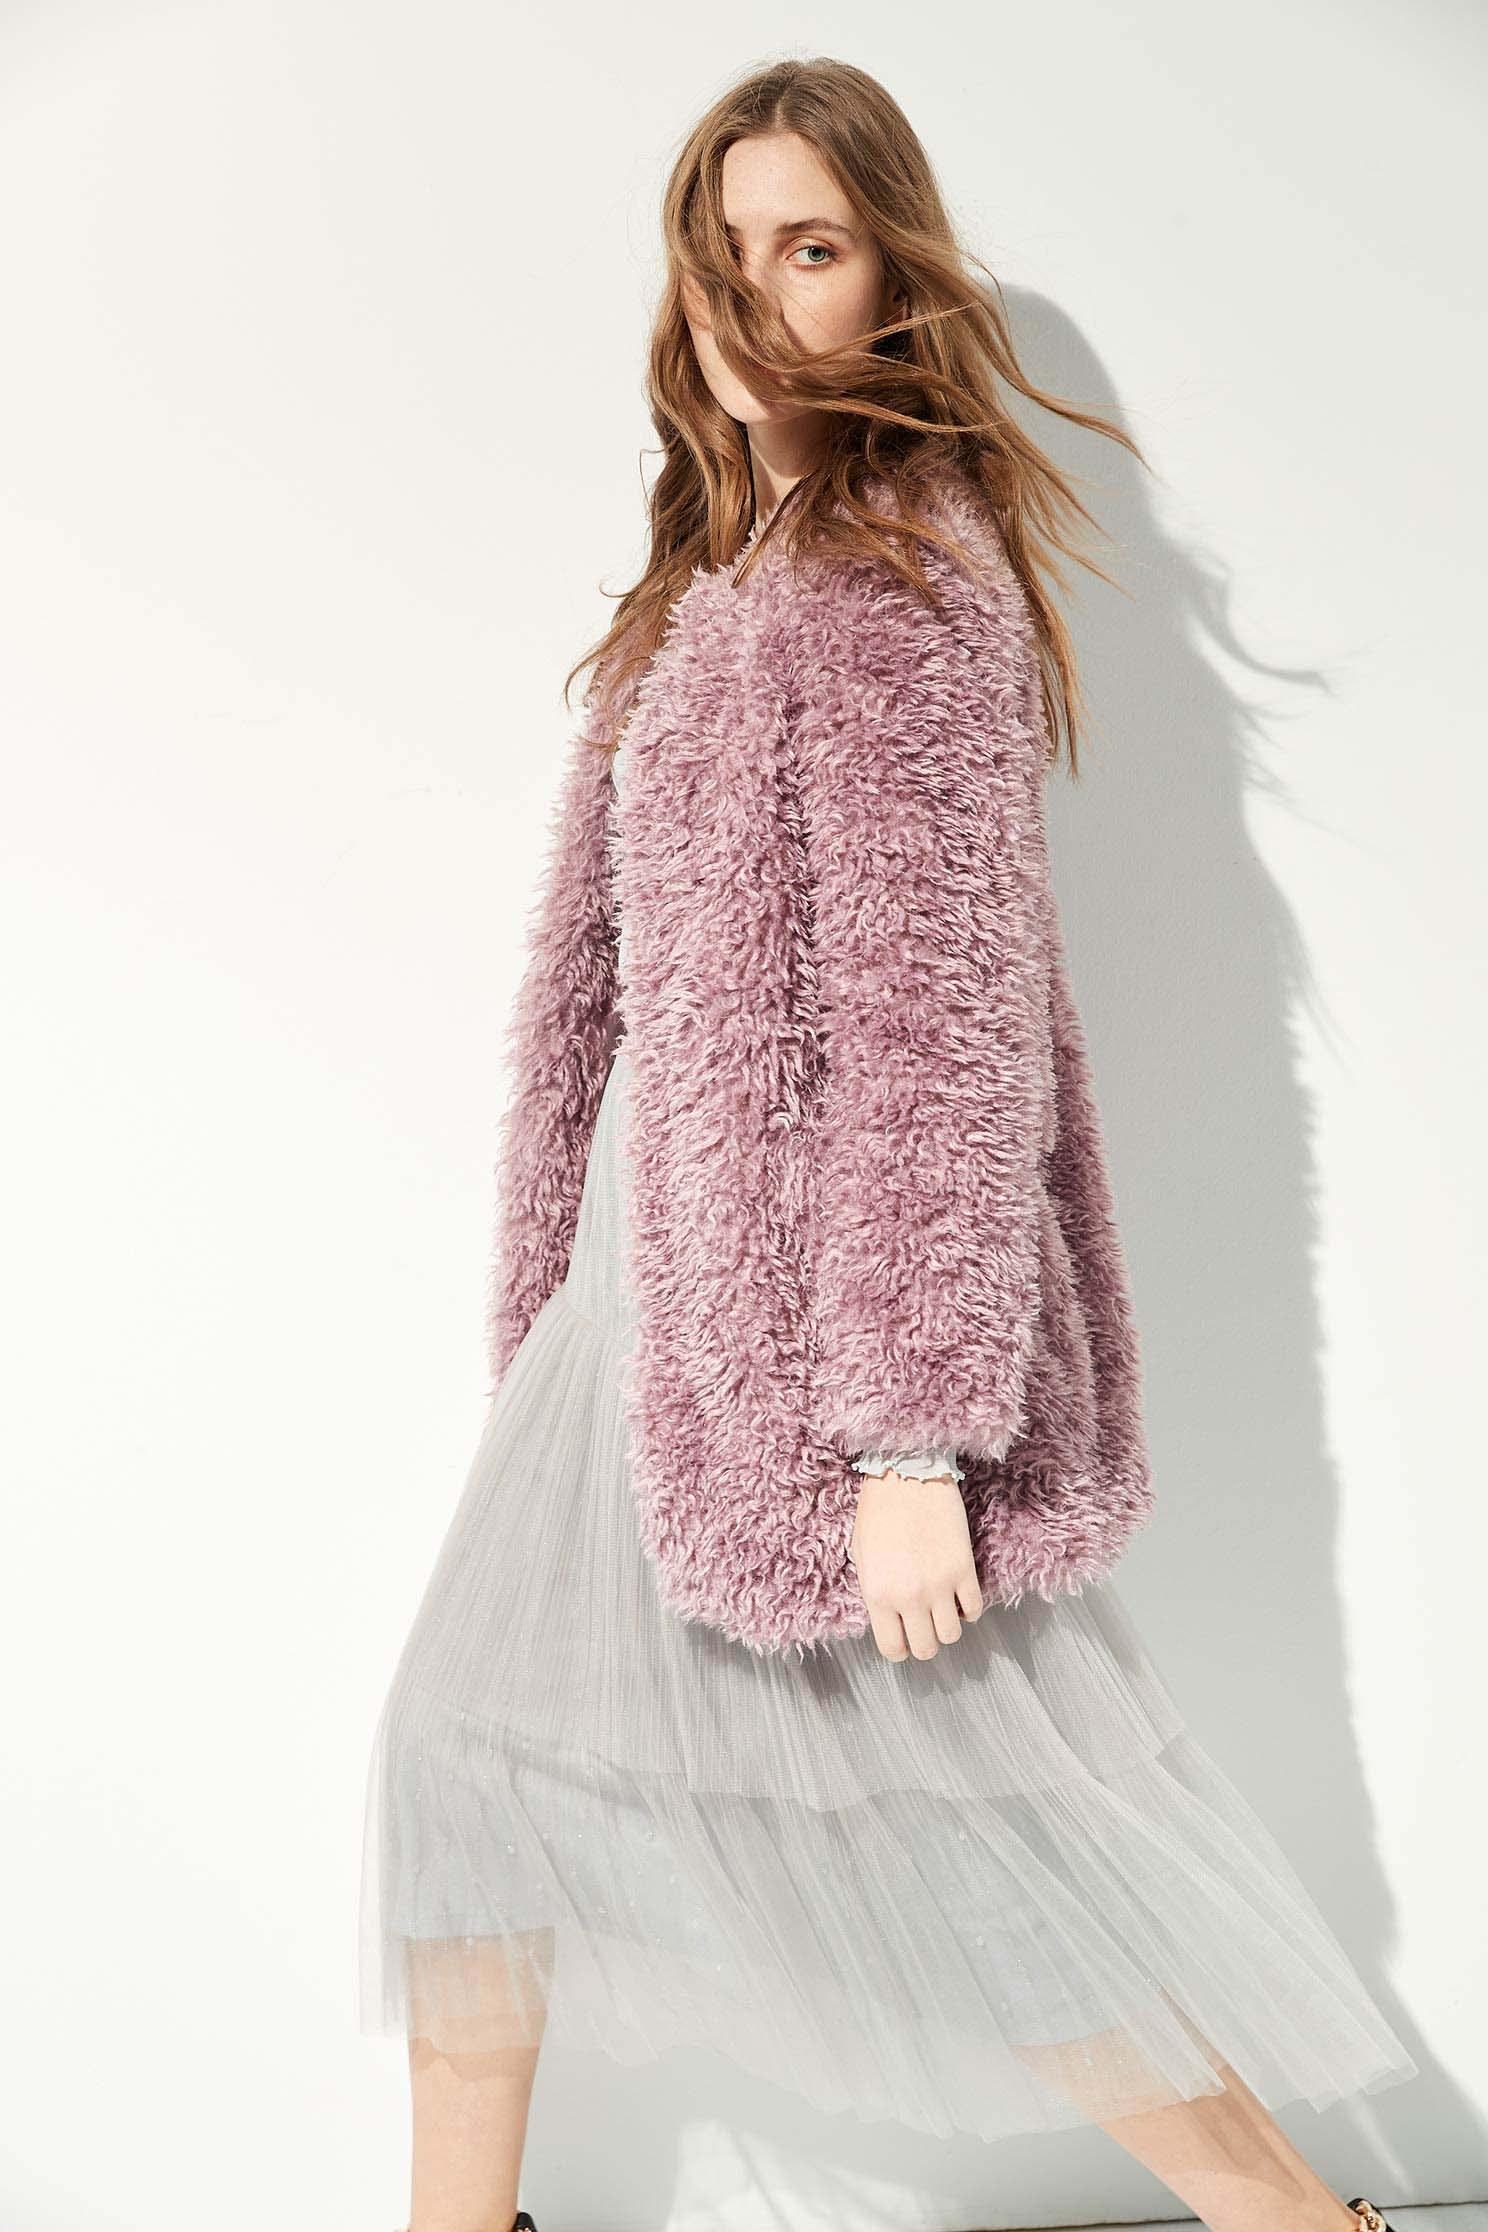 Fleece Textured coat,Jackets,Ready for Winter,Outerwear,Season (AW) Look,Long sleeve outerwear